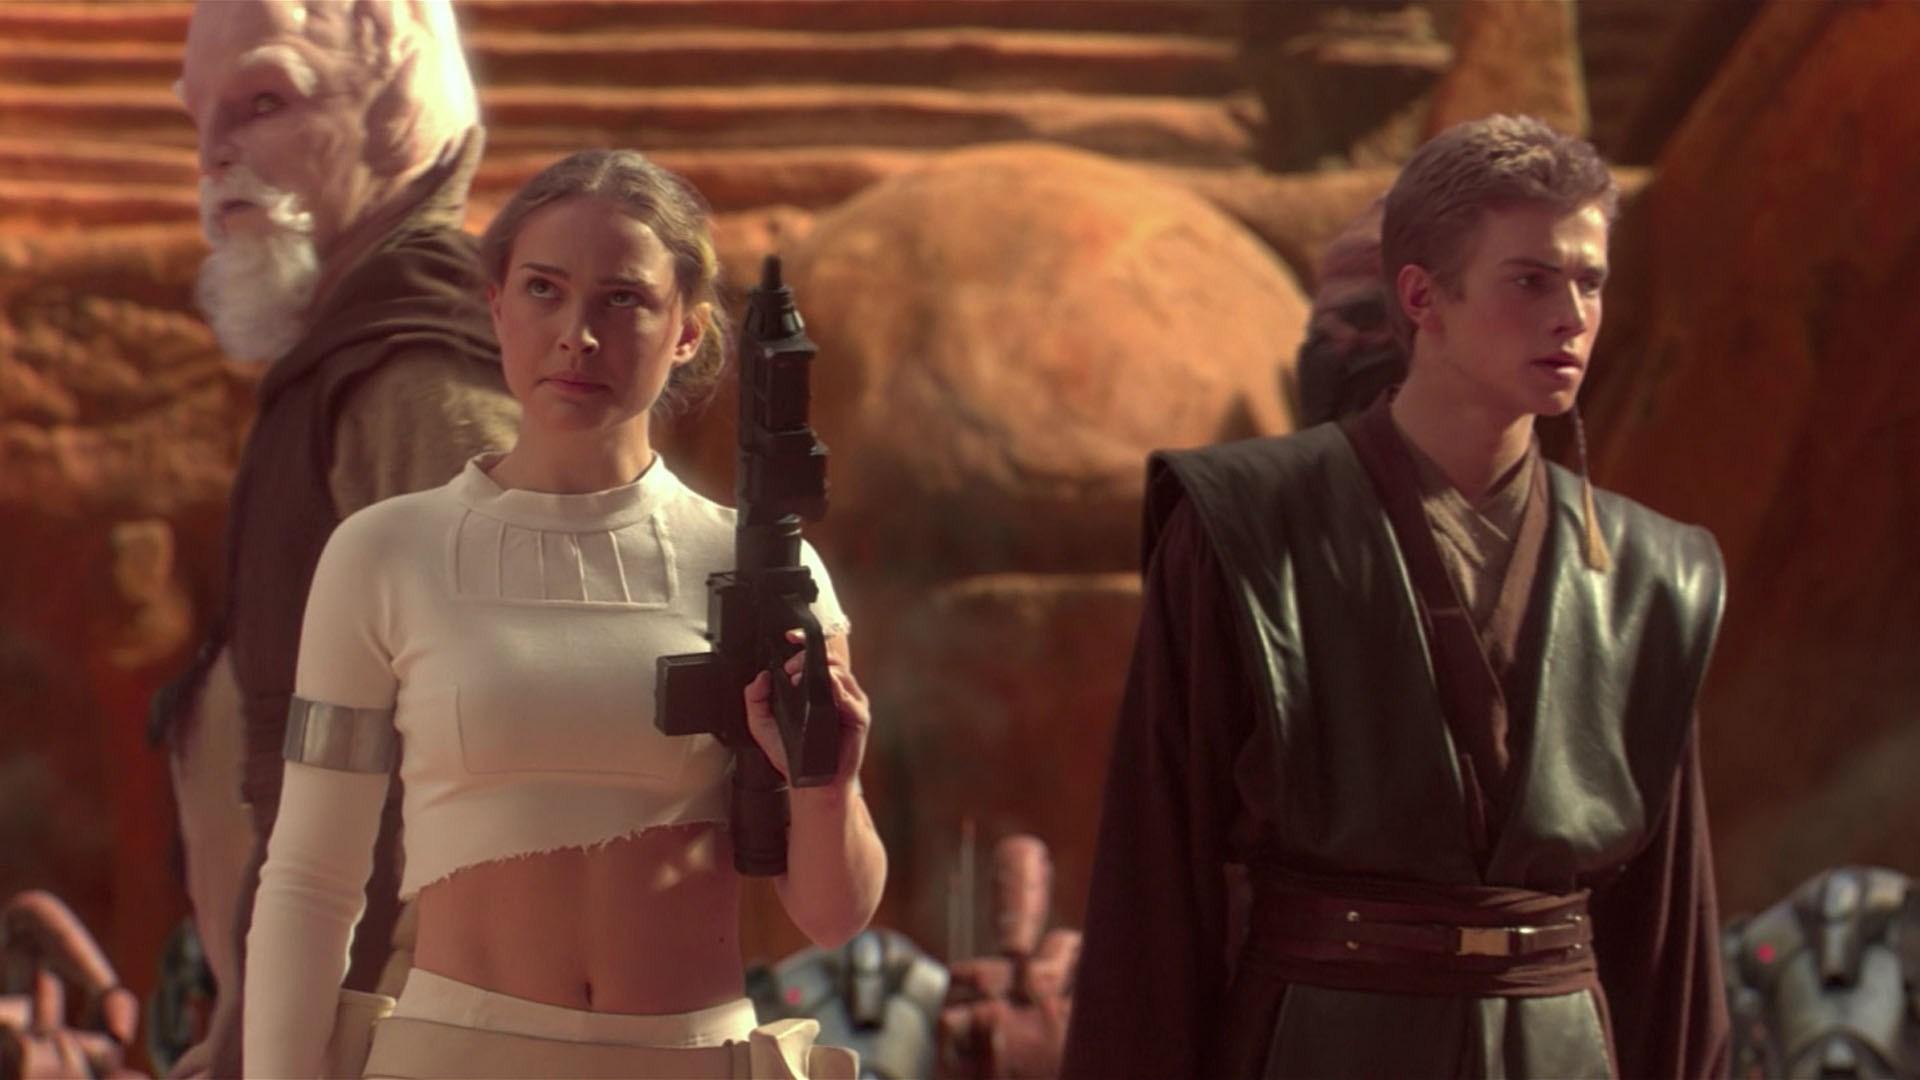 Star Wars Episode Ii Attack Of The Clones Stills Wallpapers